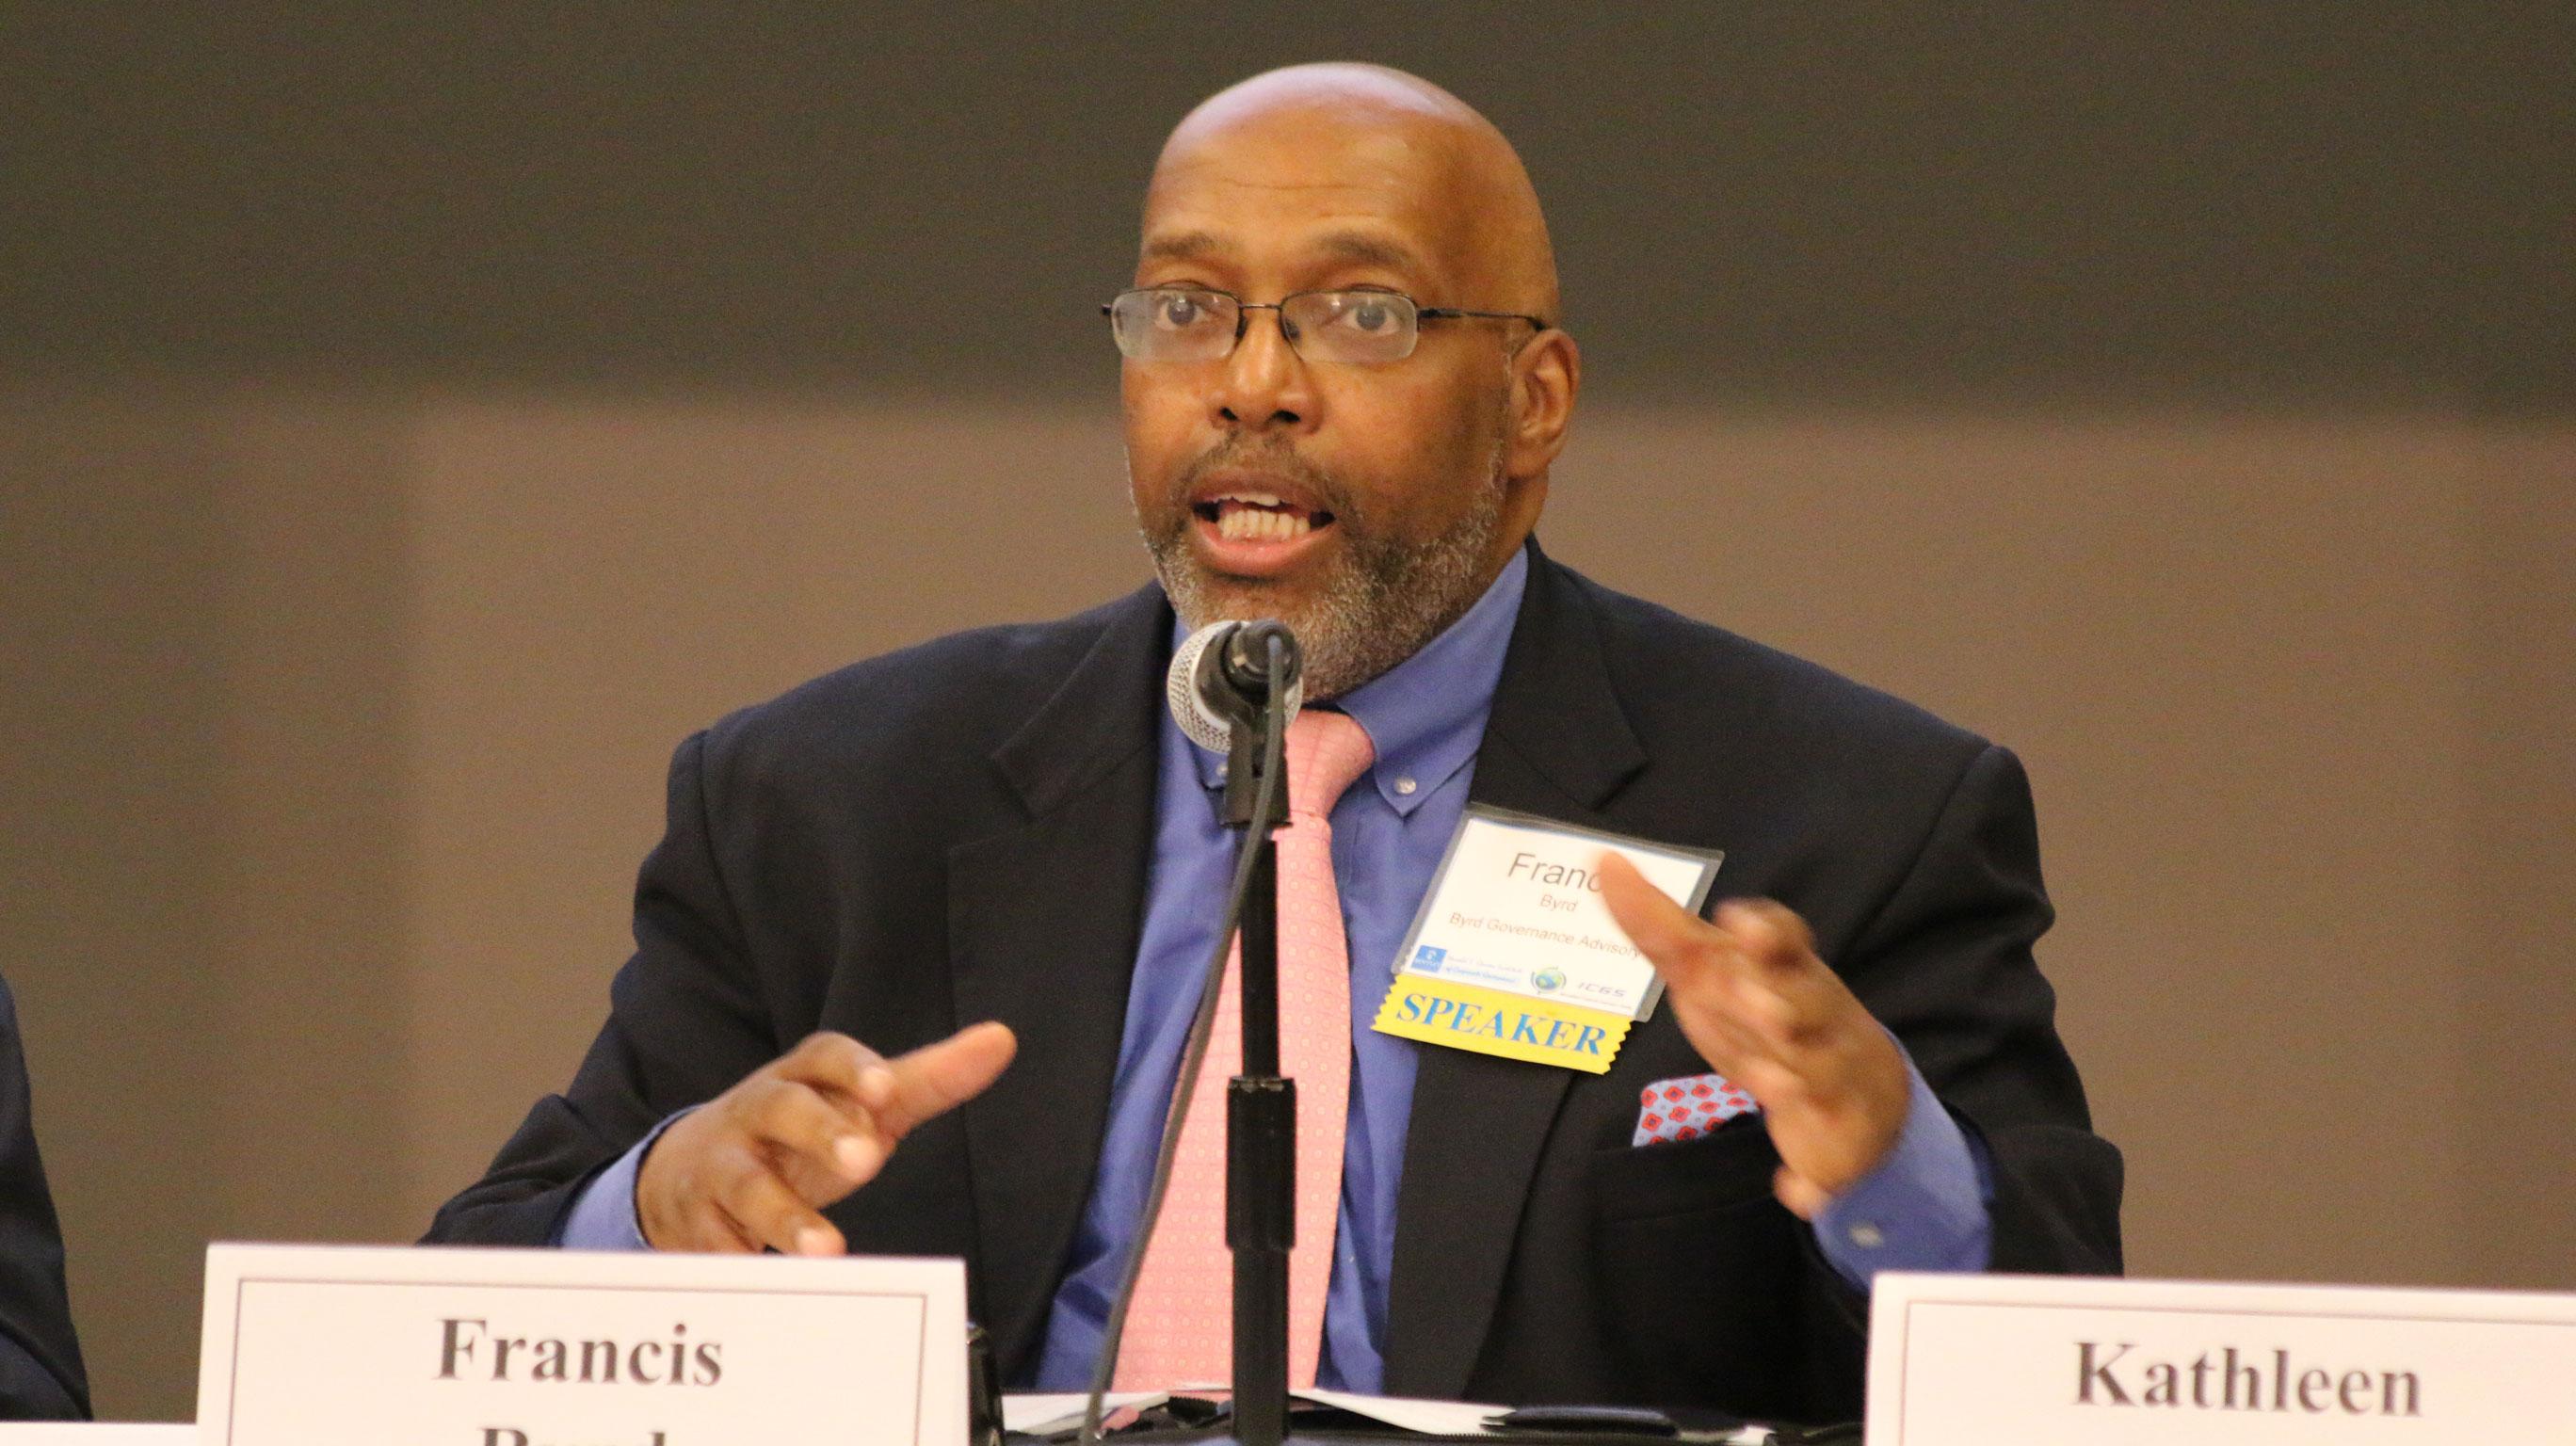 Distinguished Panelist Francis Byrd